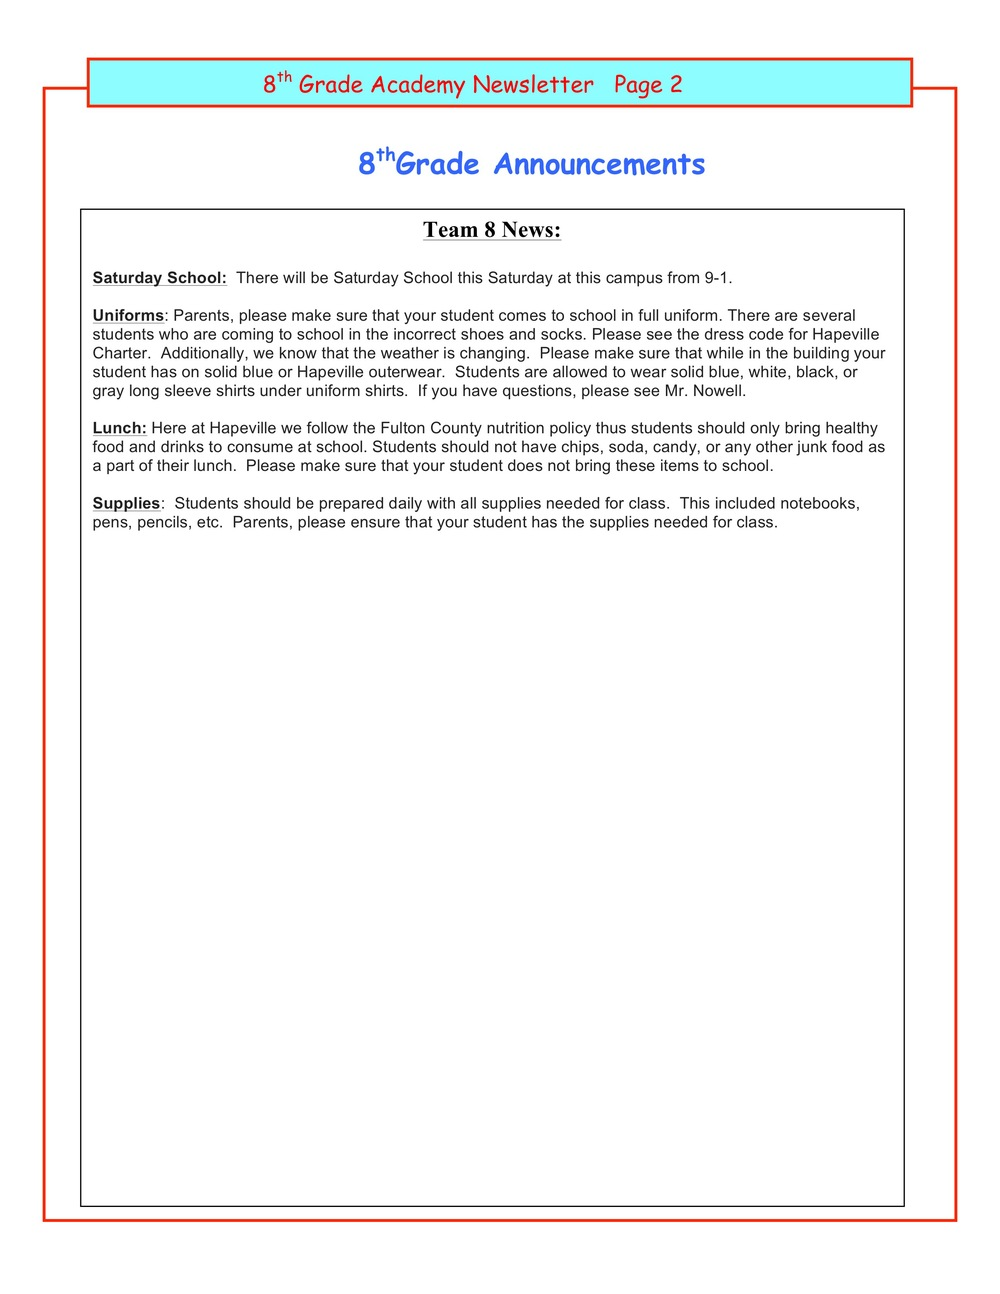 Newsletter Image8th grade January 6 2.jpeg